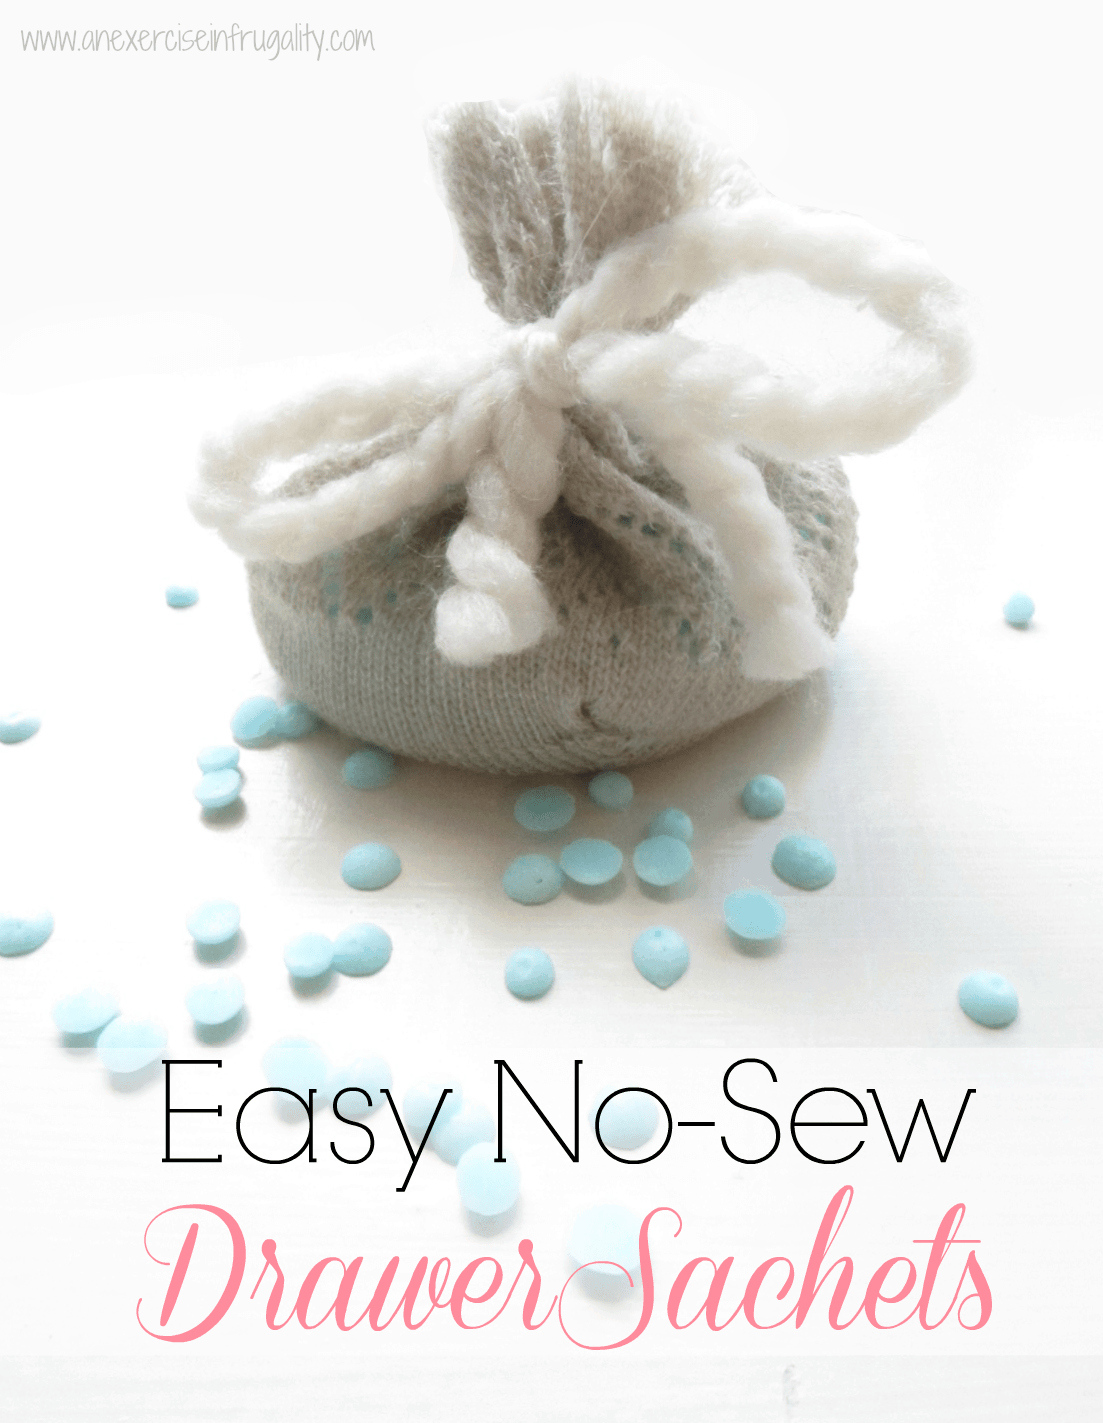 No-Sew Drawer Sachets